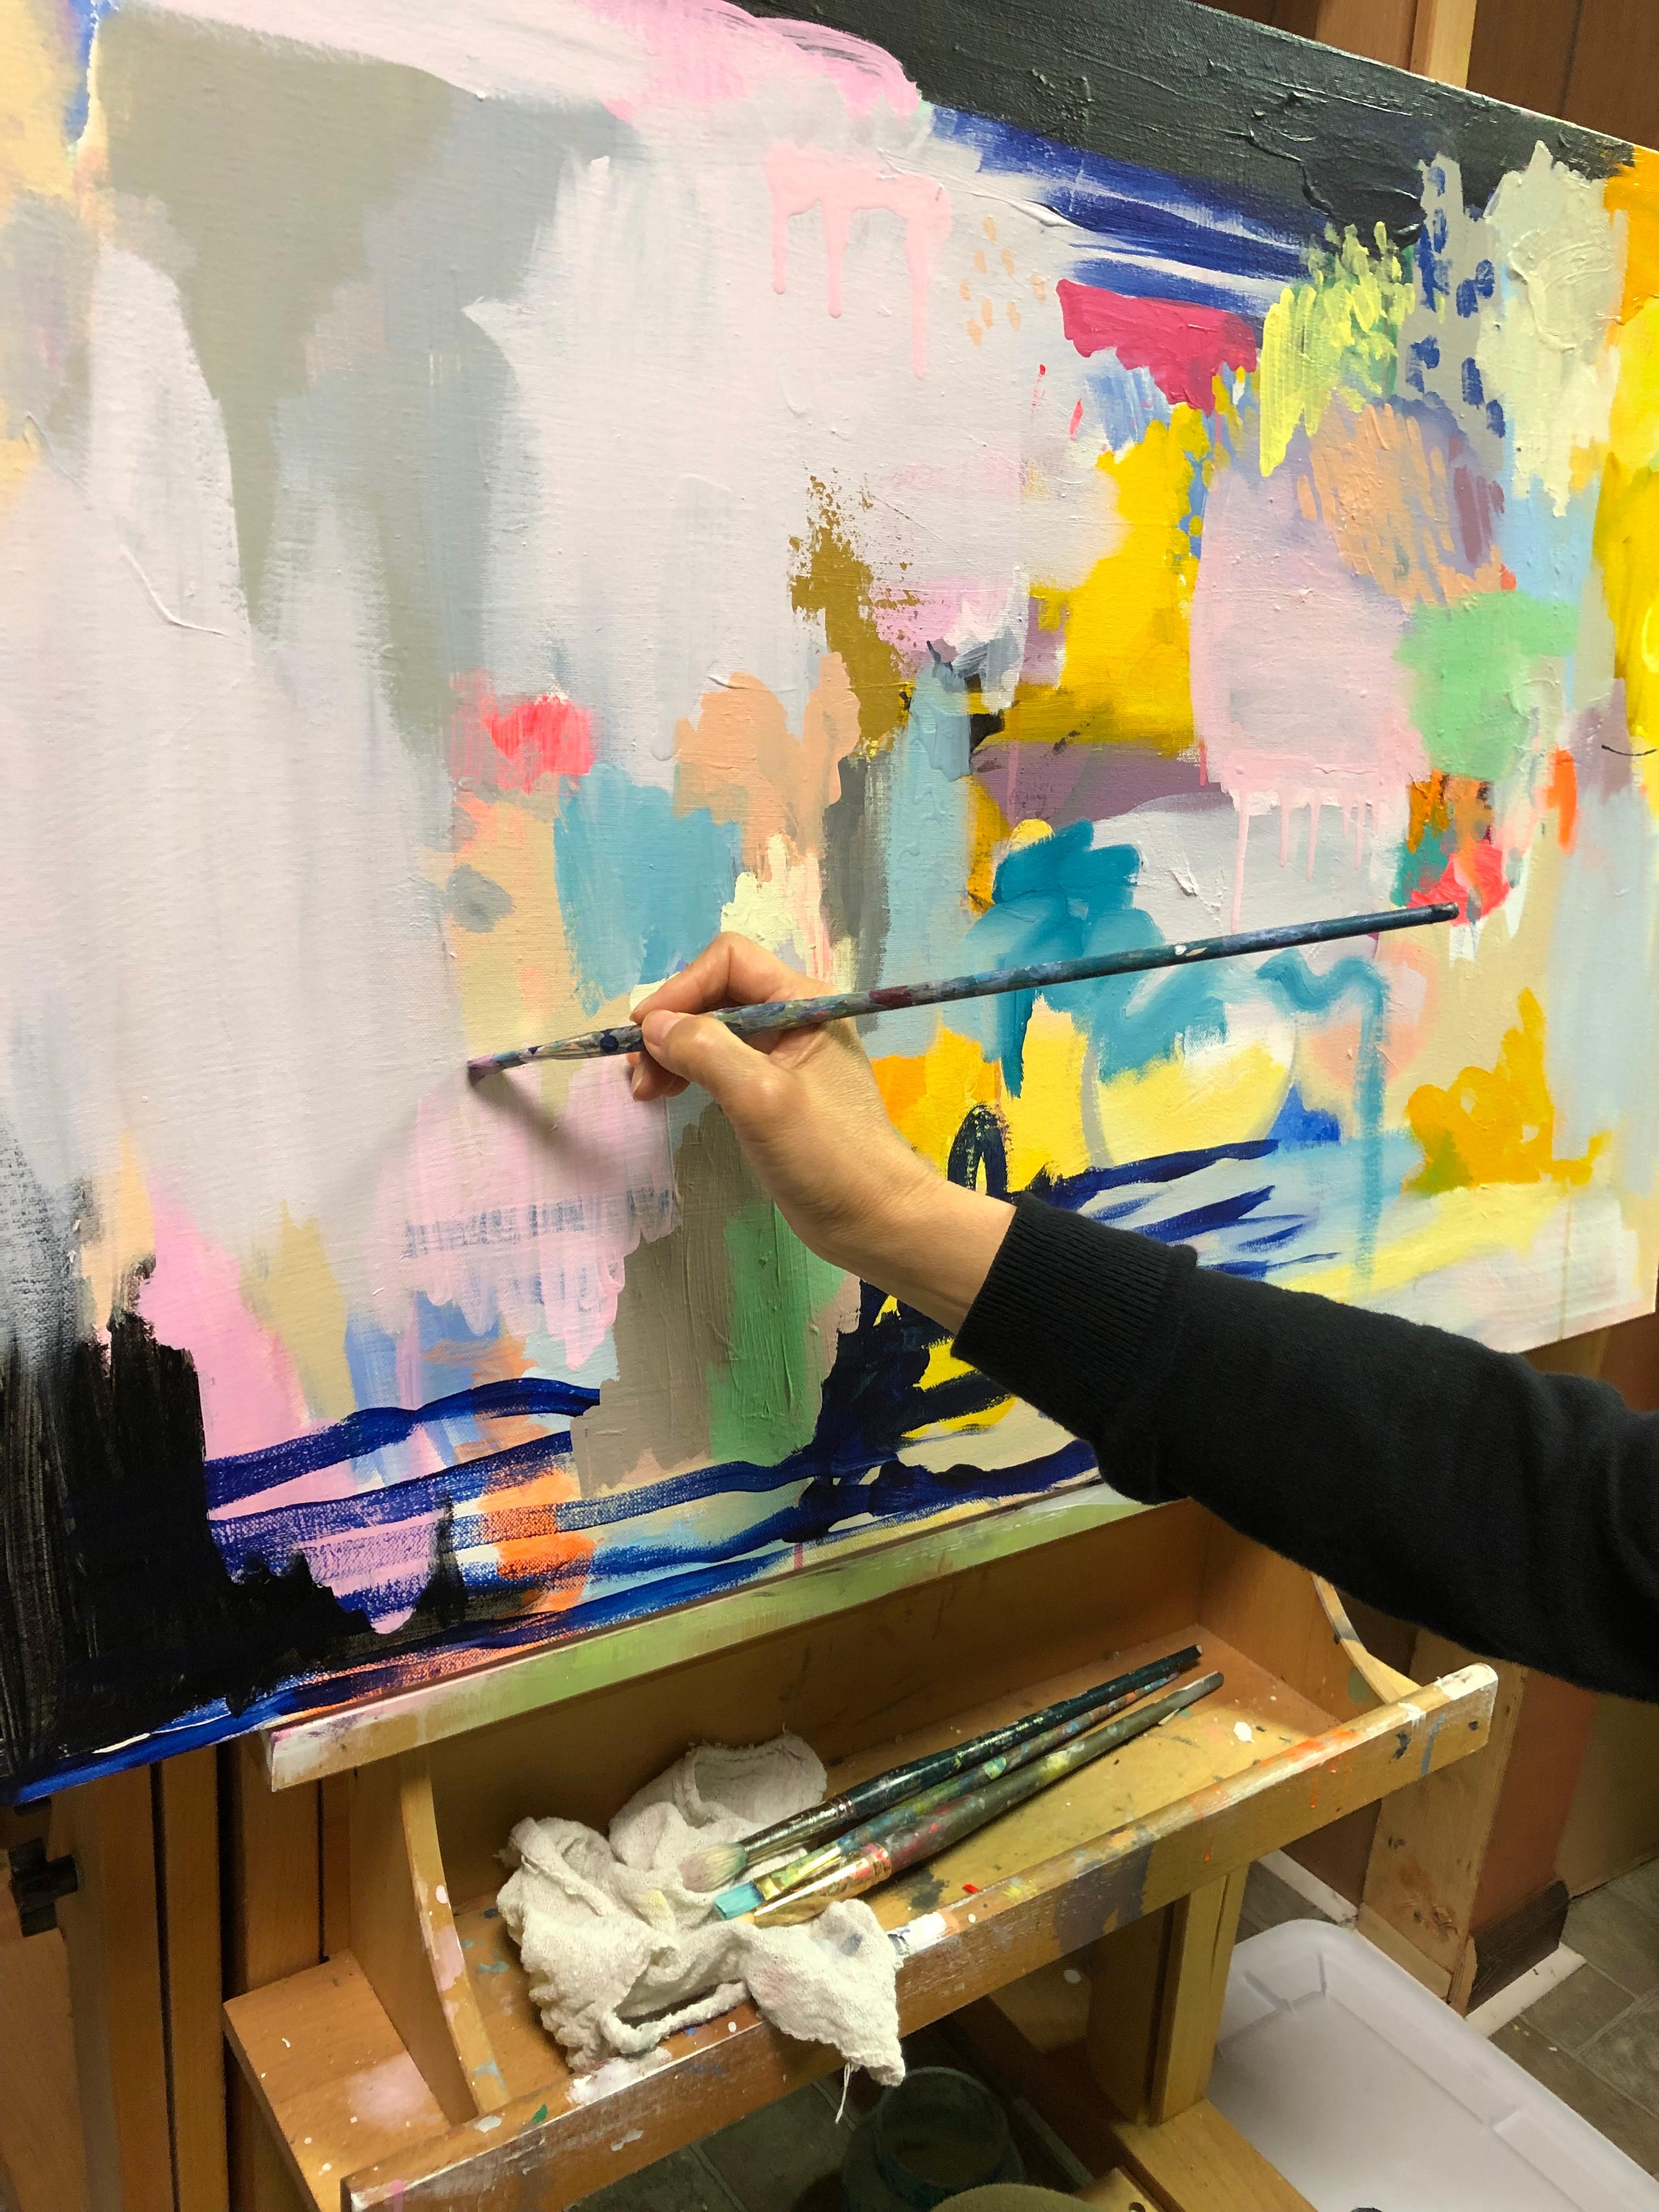 Open Studio Art - Tuesday Evenings